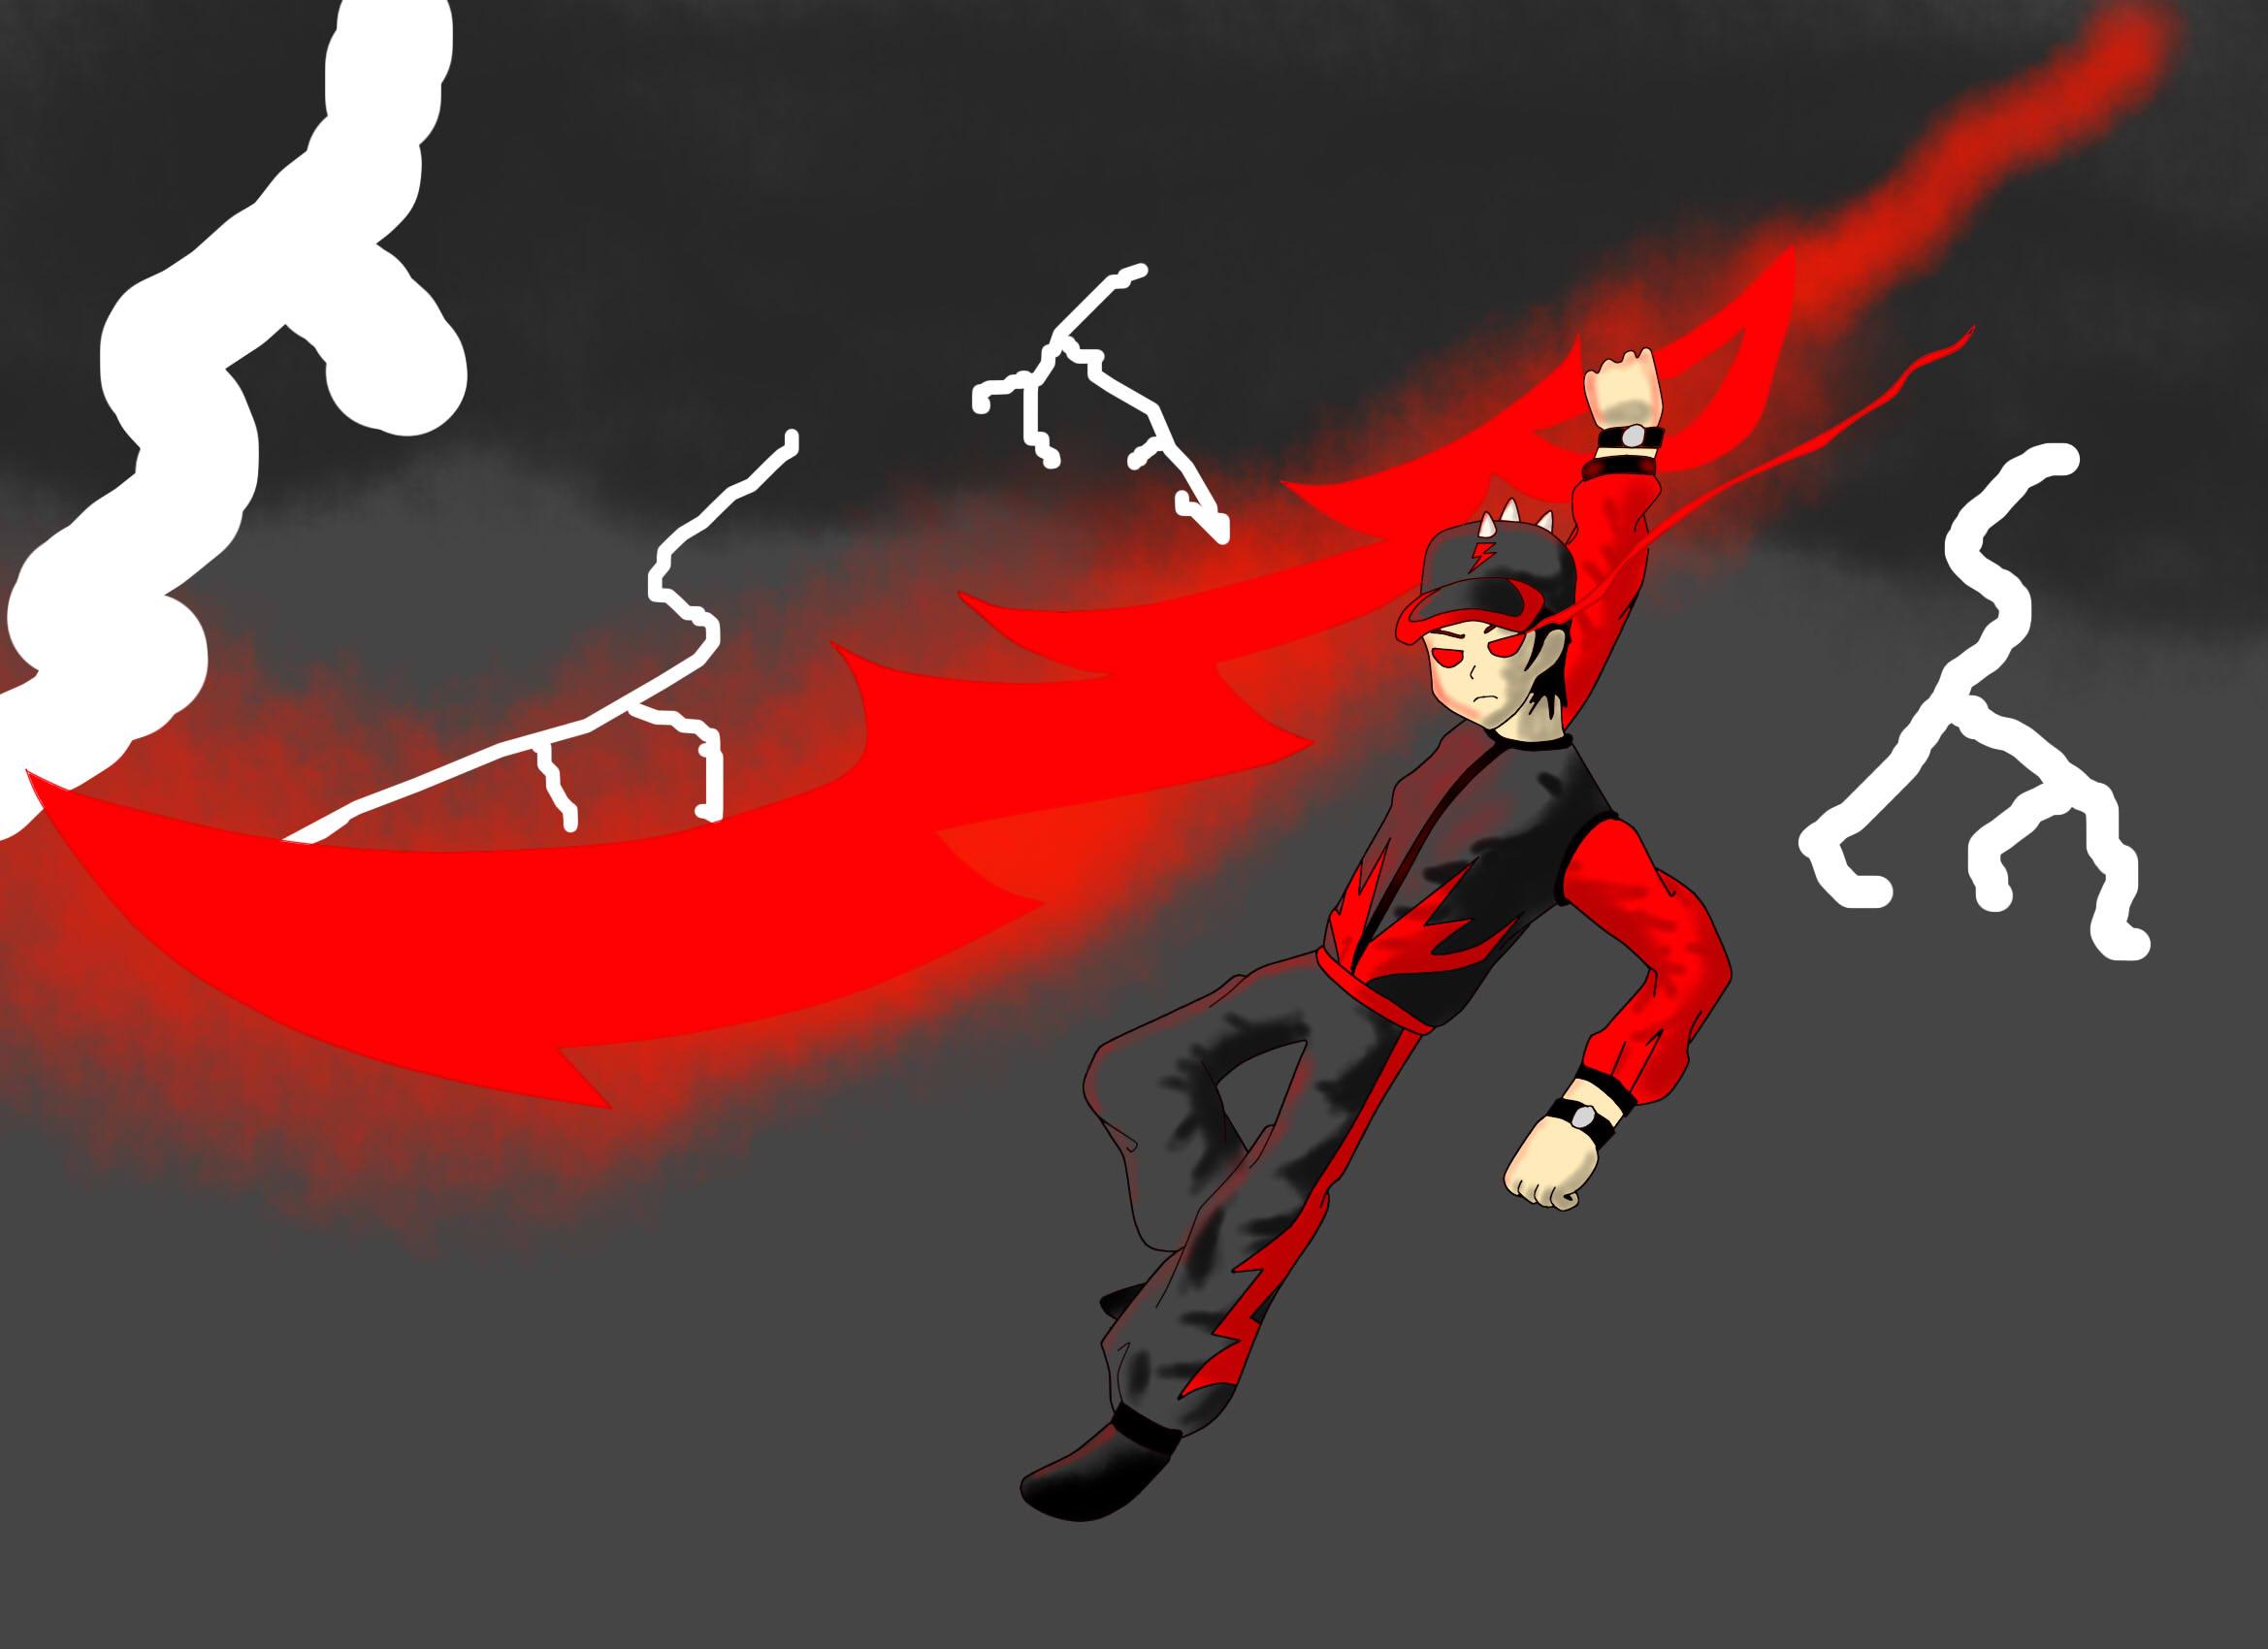 Boboiboy Halilintar Boboiboy Thunderstorm Boboiboy Anime